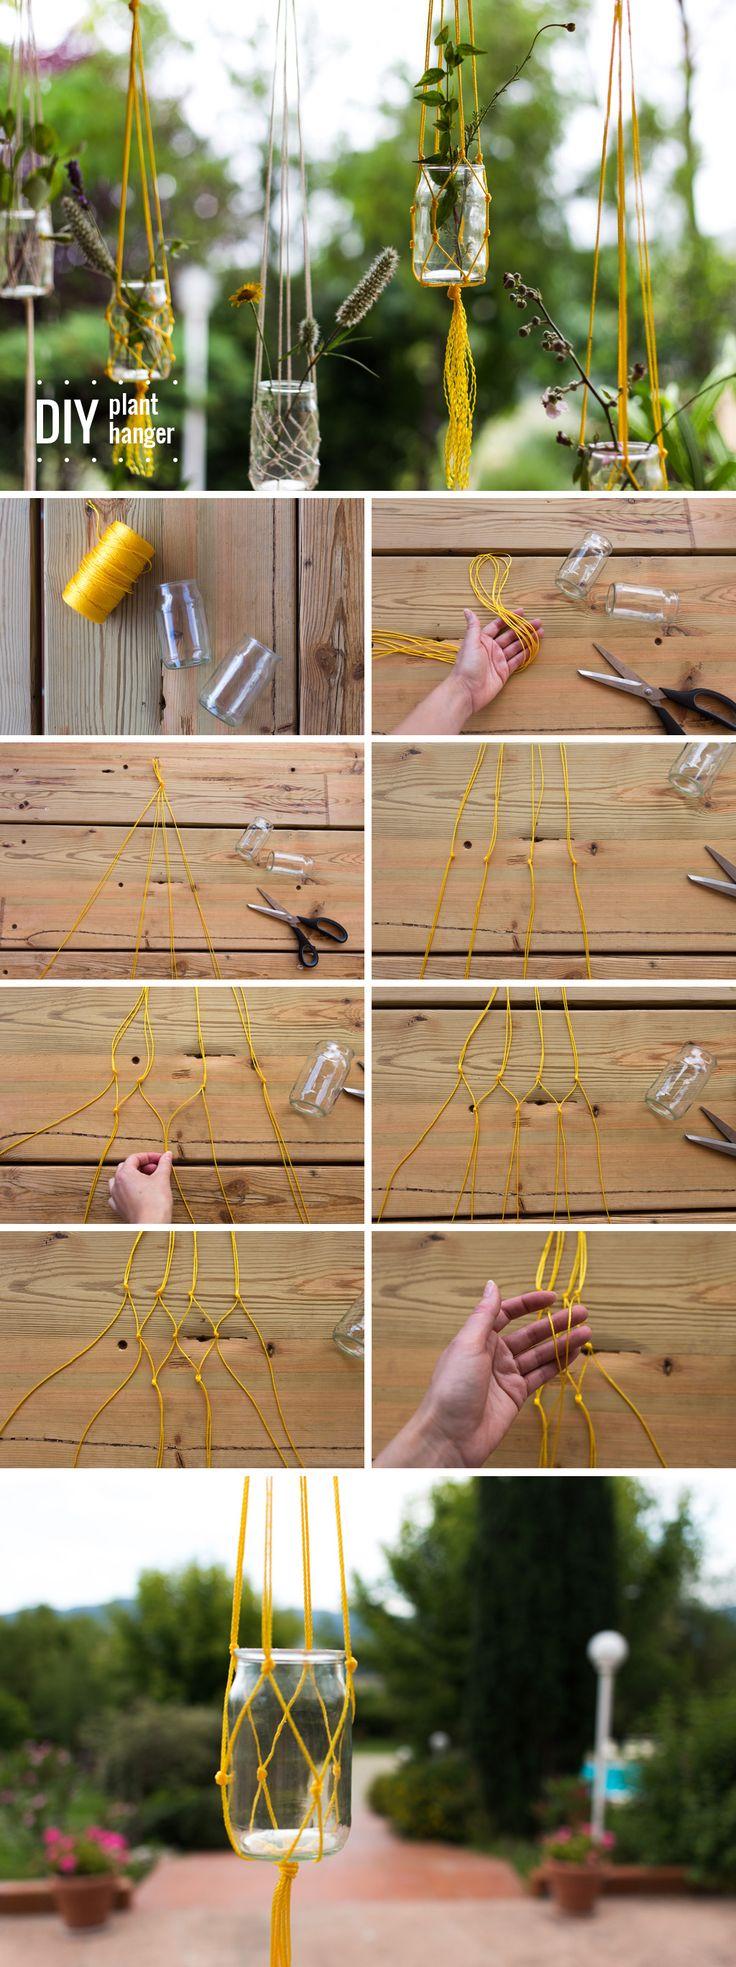 DIY: plant hanger